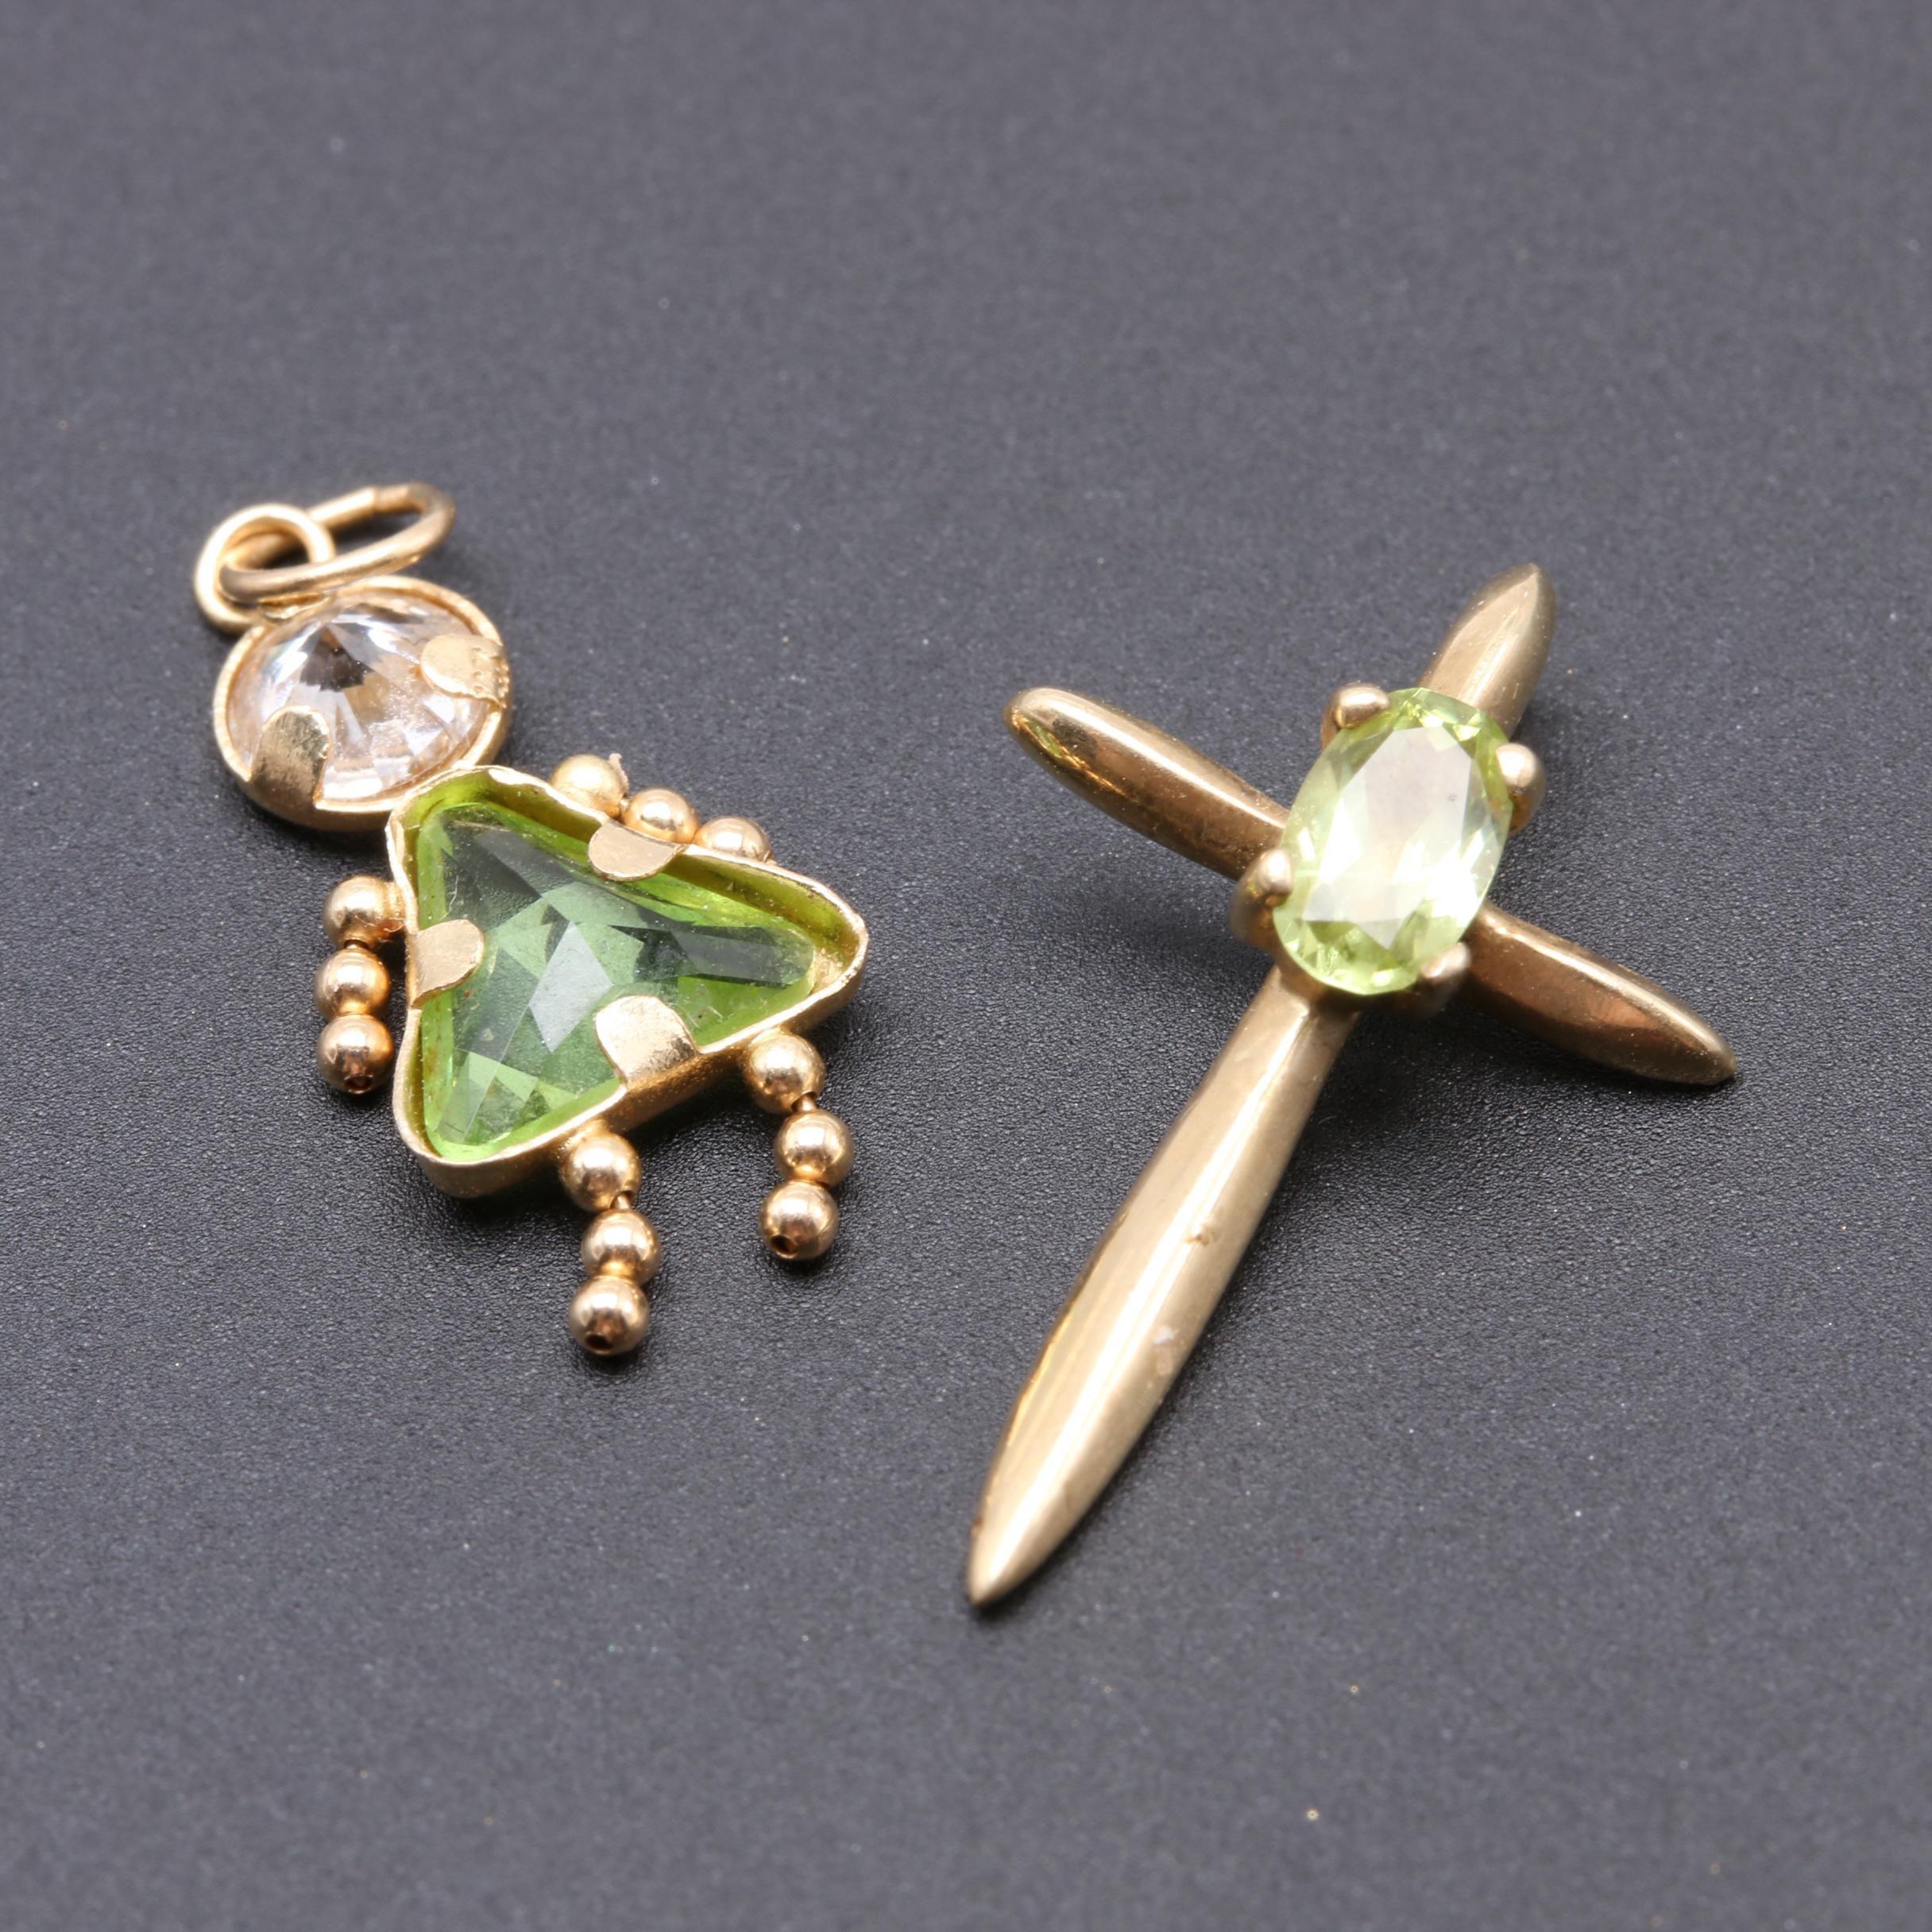 10K Yellow Gold Peridot Cross and 14K Cubic Zirconia and Glass Girl Pendant